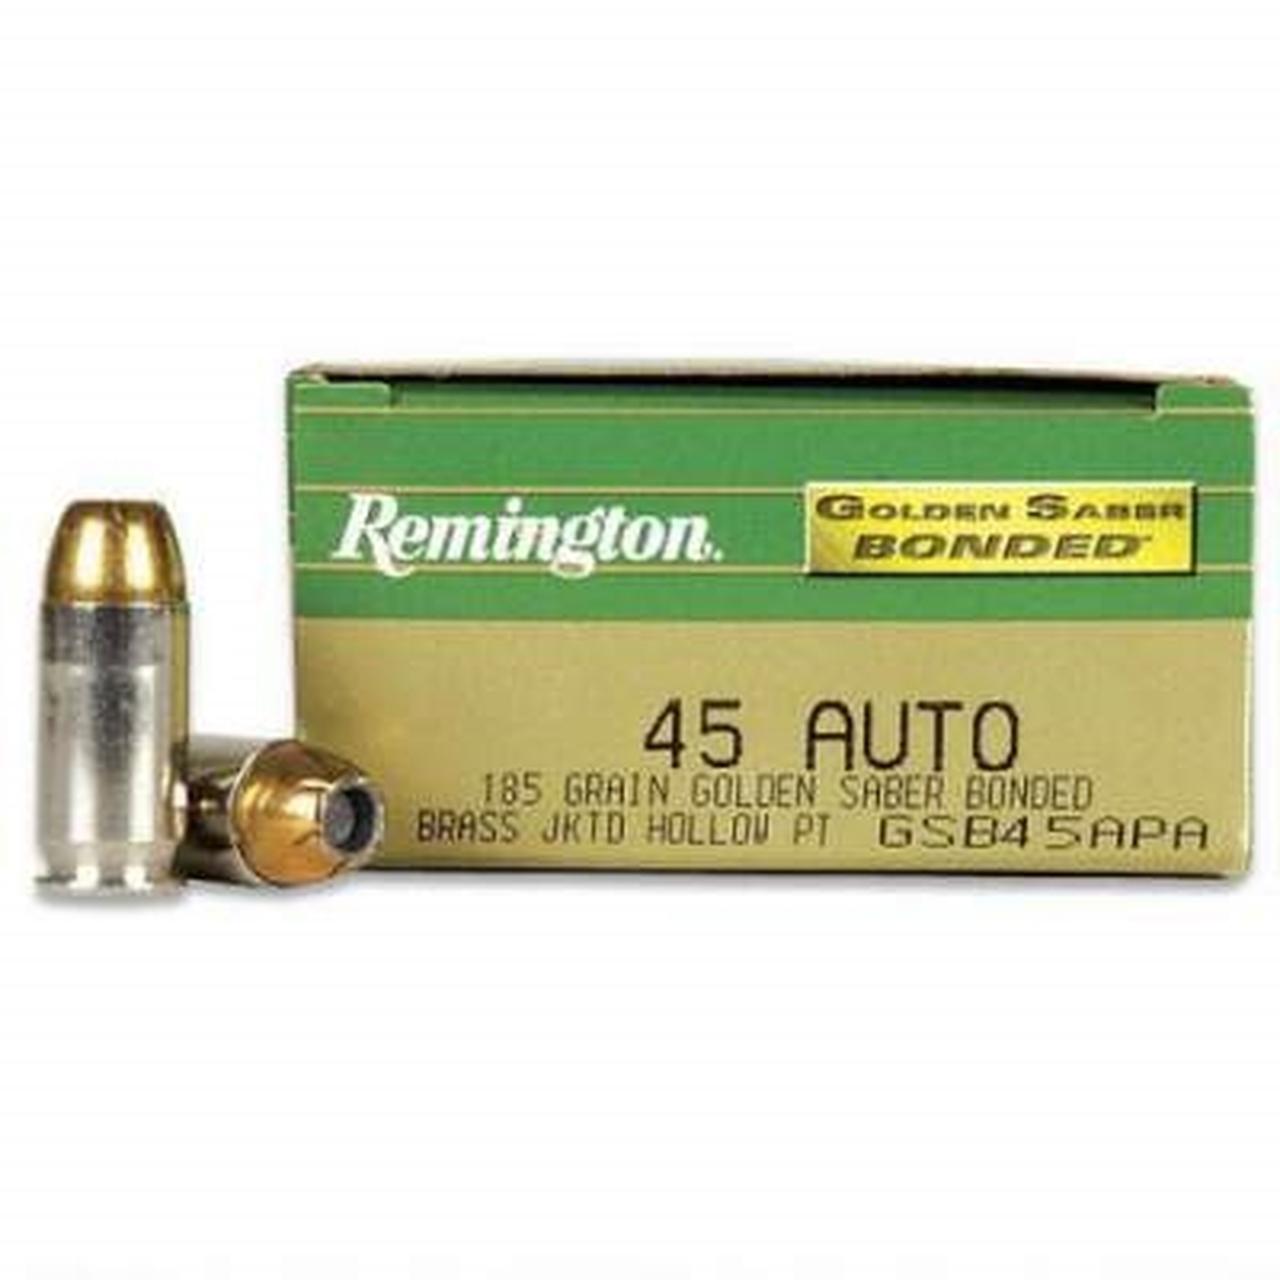 Remington Golden Saber 45 ACP 185gr Bonded JHP - 50 rnds | GSB45APA-Remington